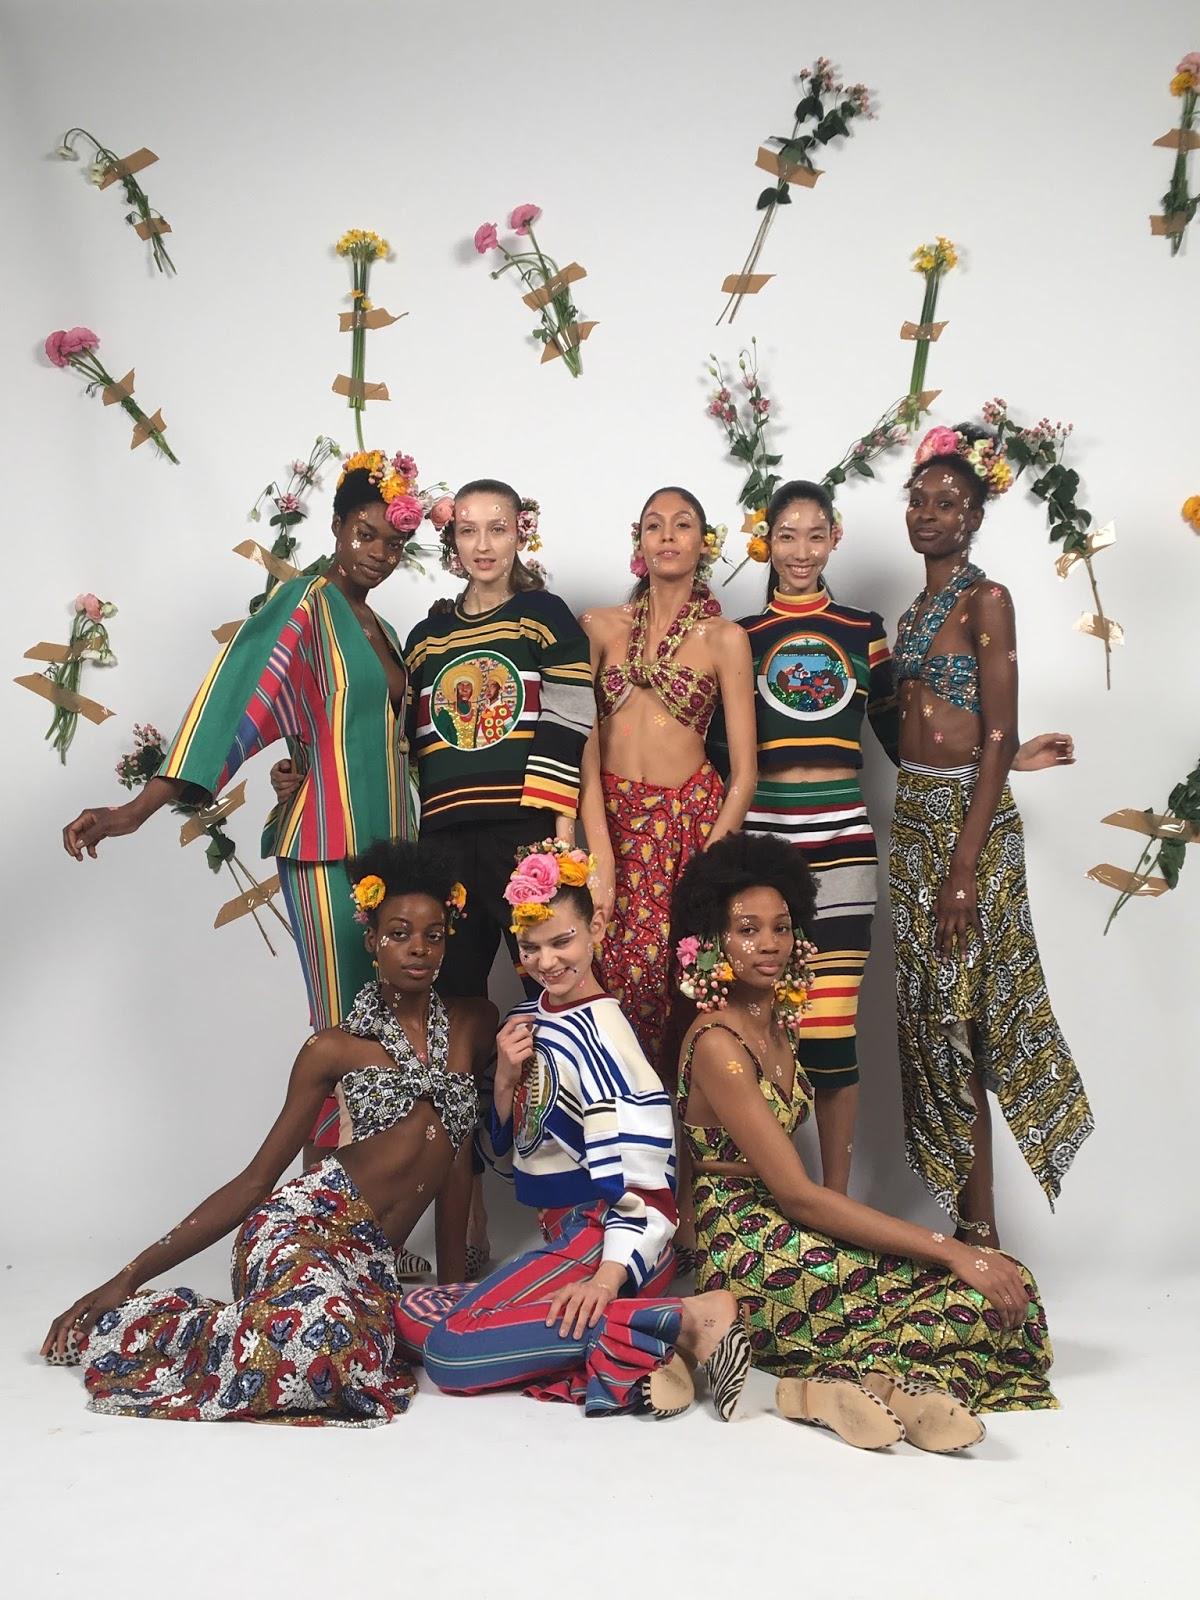 Tata Naka Autumn / Winter 2018 Presentation for London Fashion week